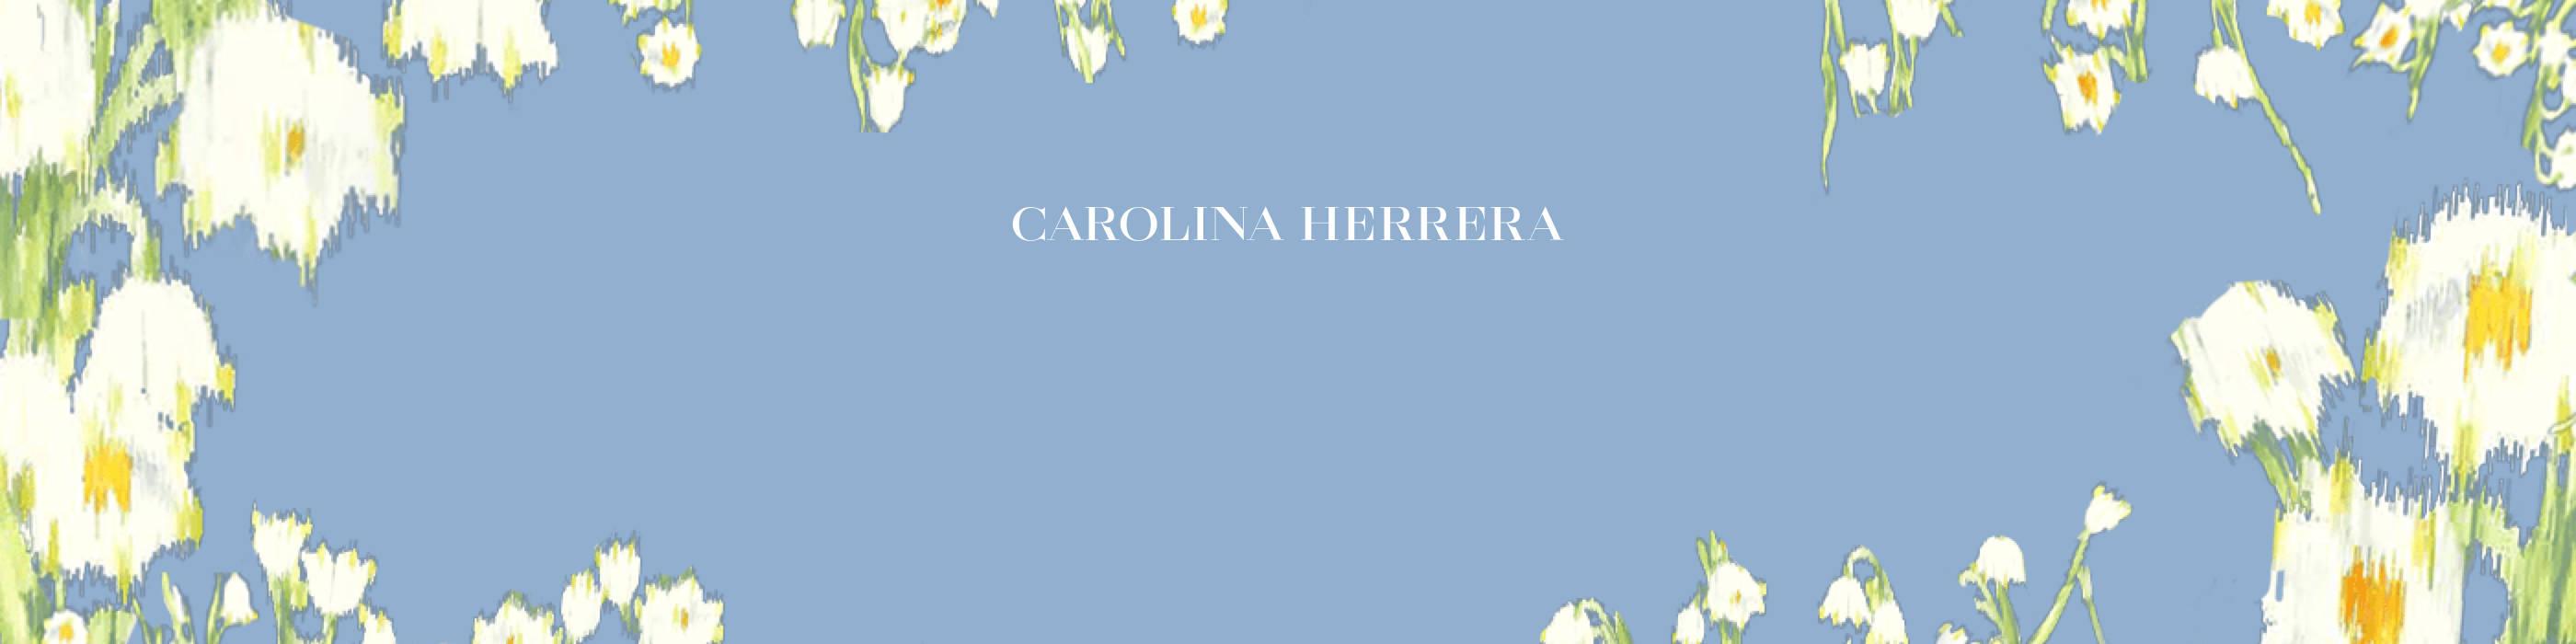 Carolina Herrera - online